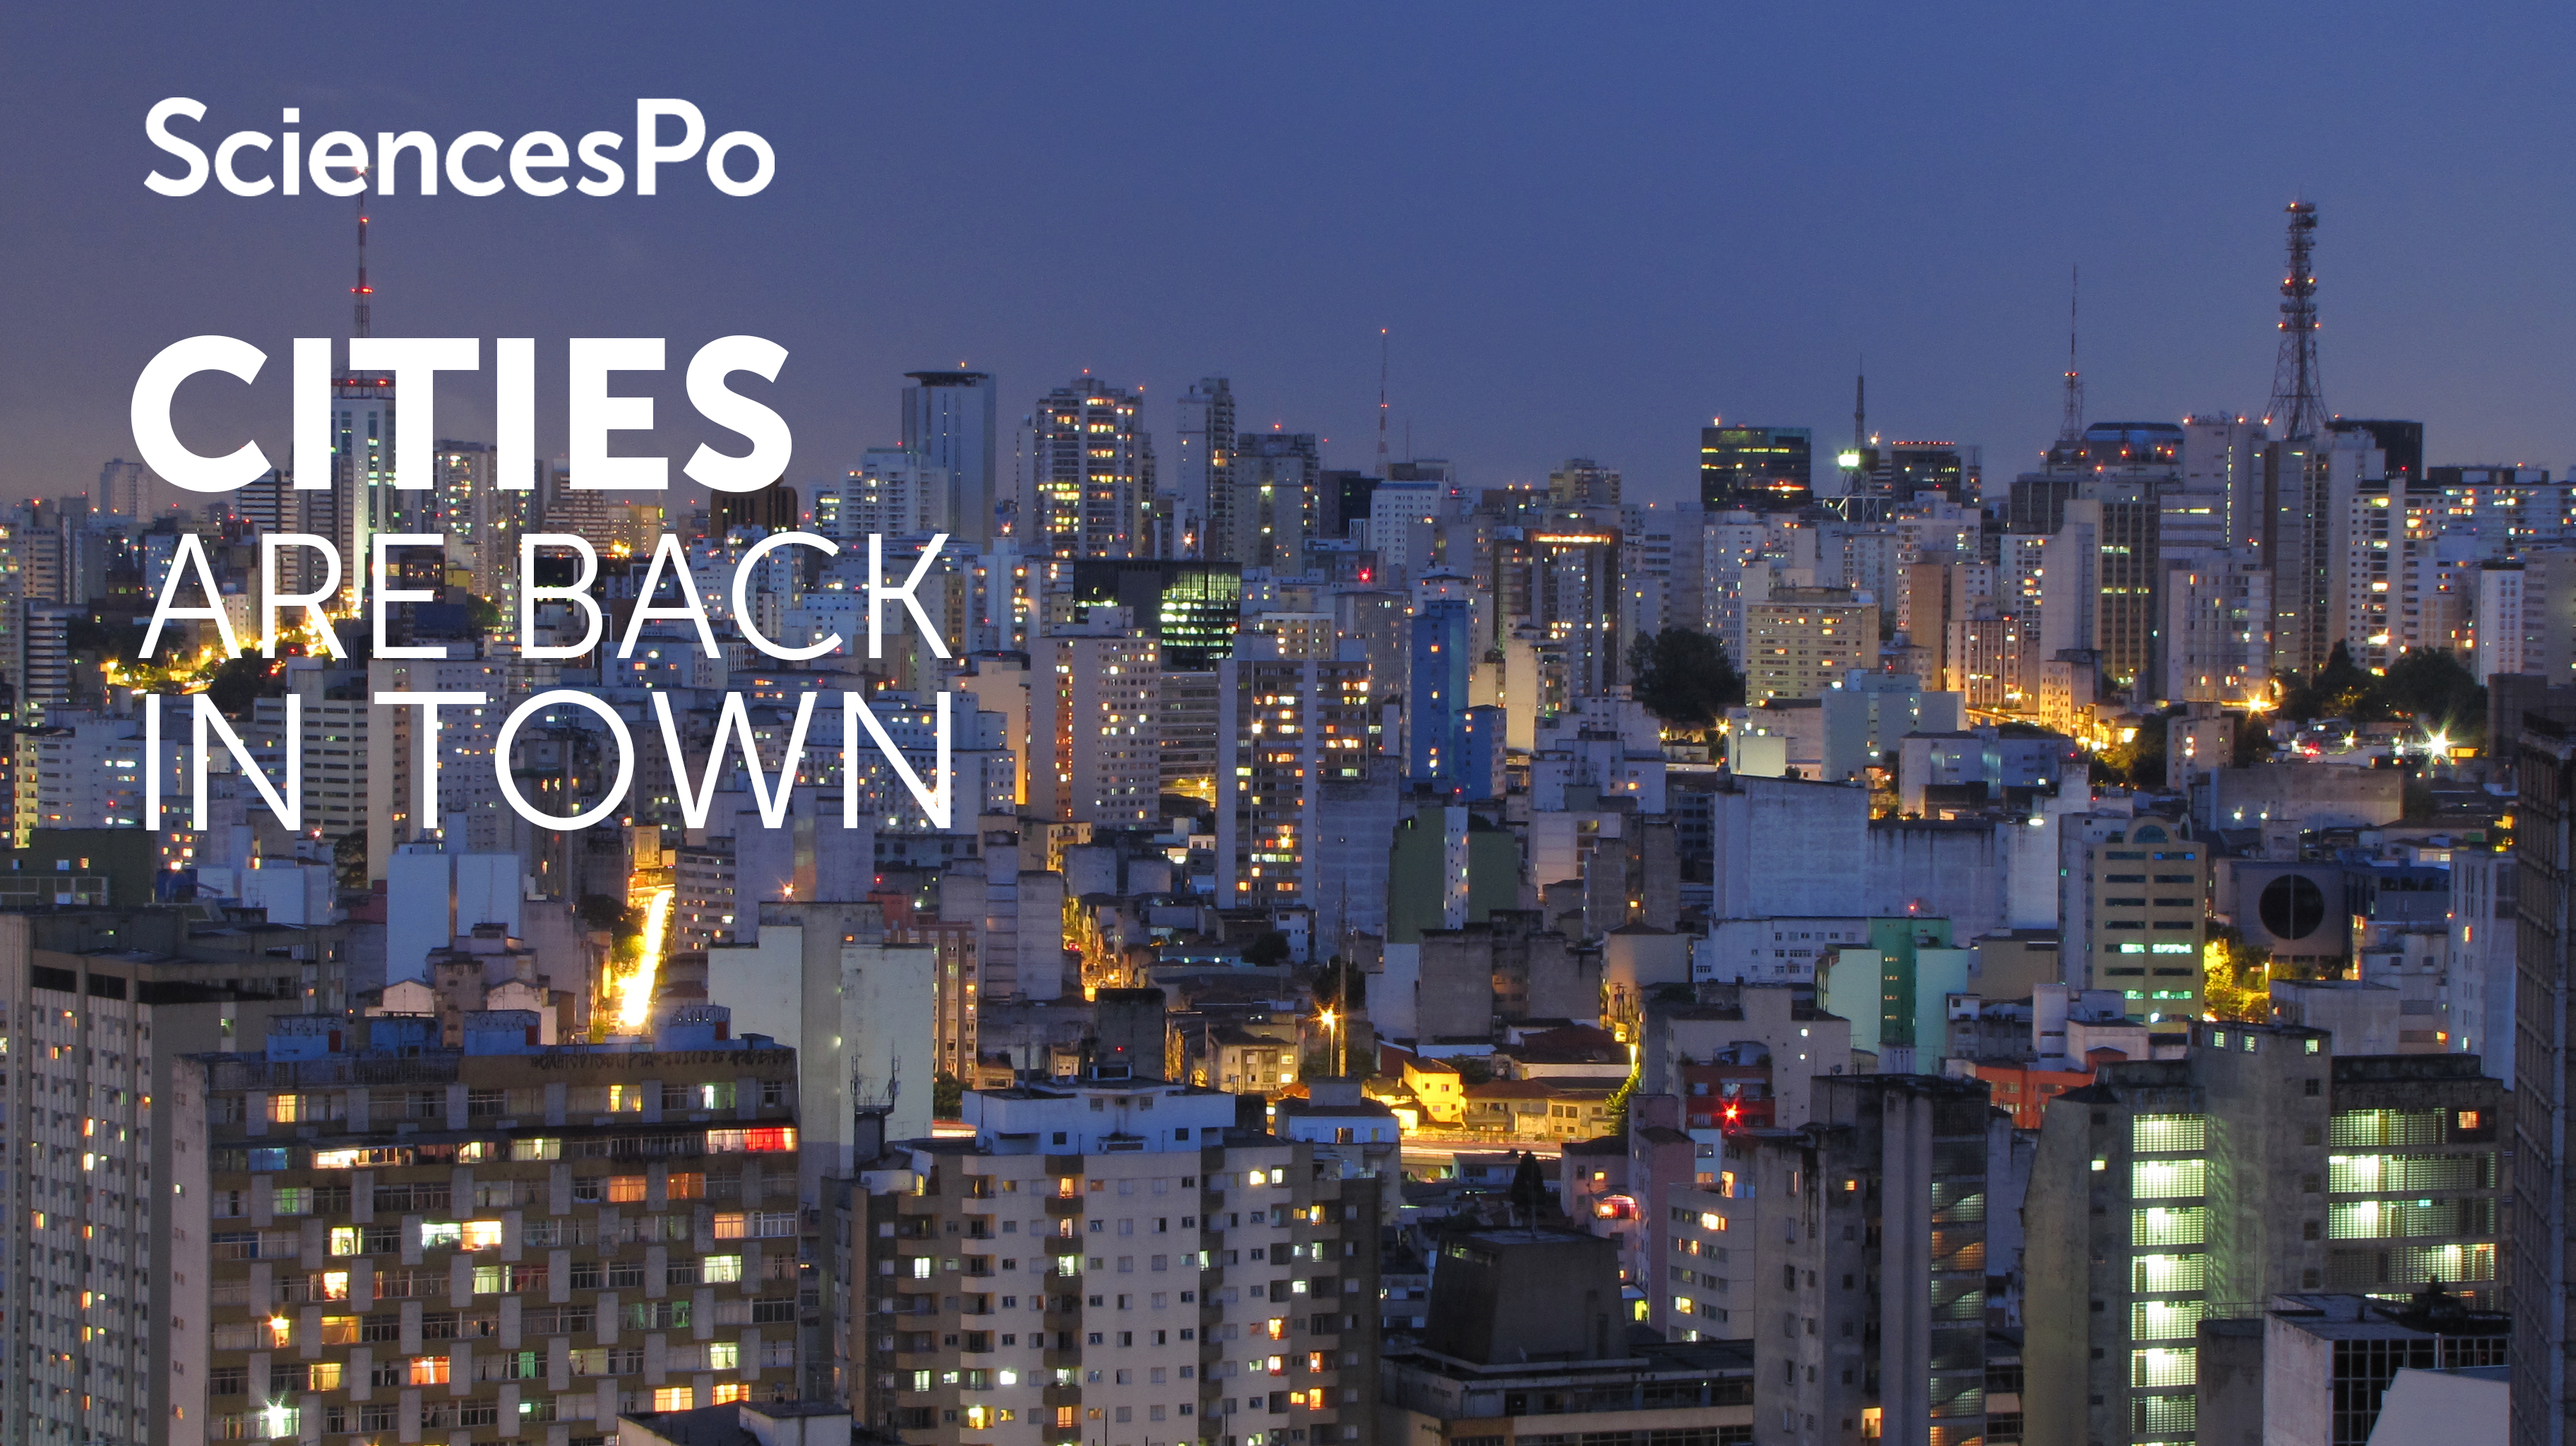 Cities are back in town : sociología urbana para un mundo globalizado course image